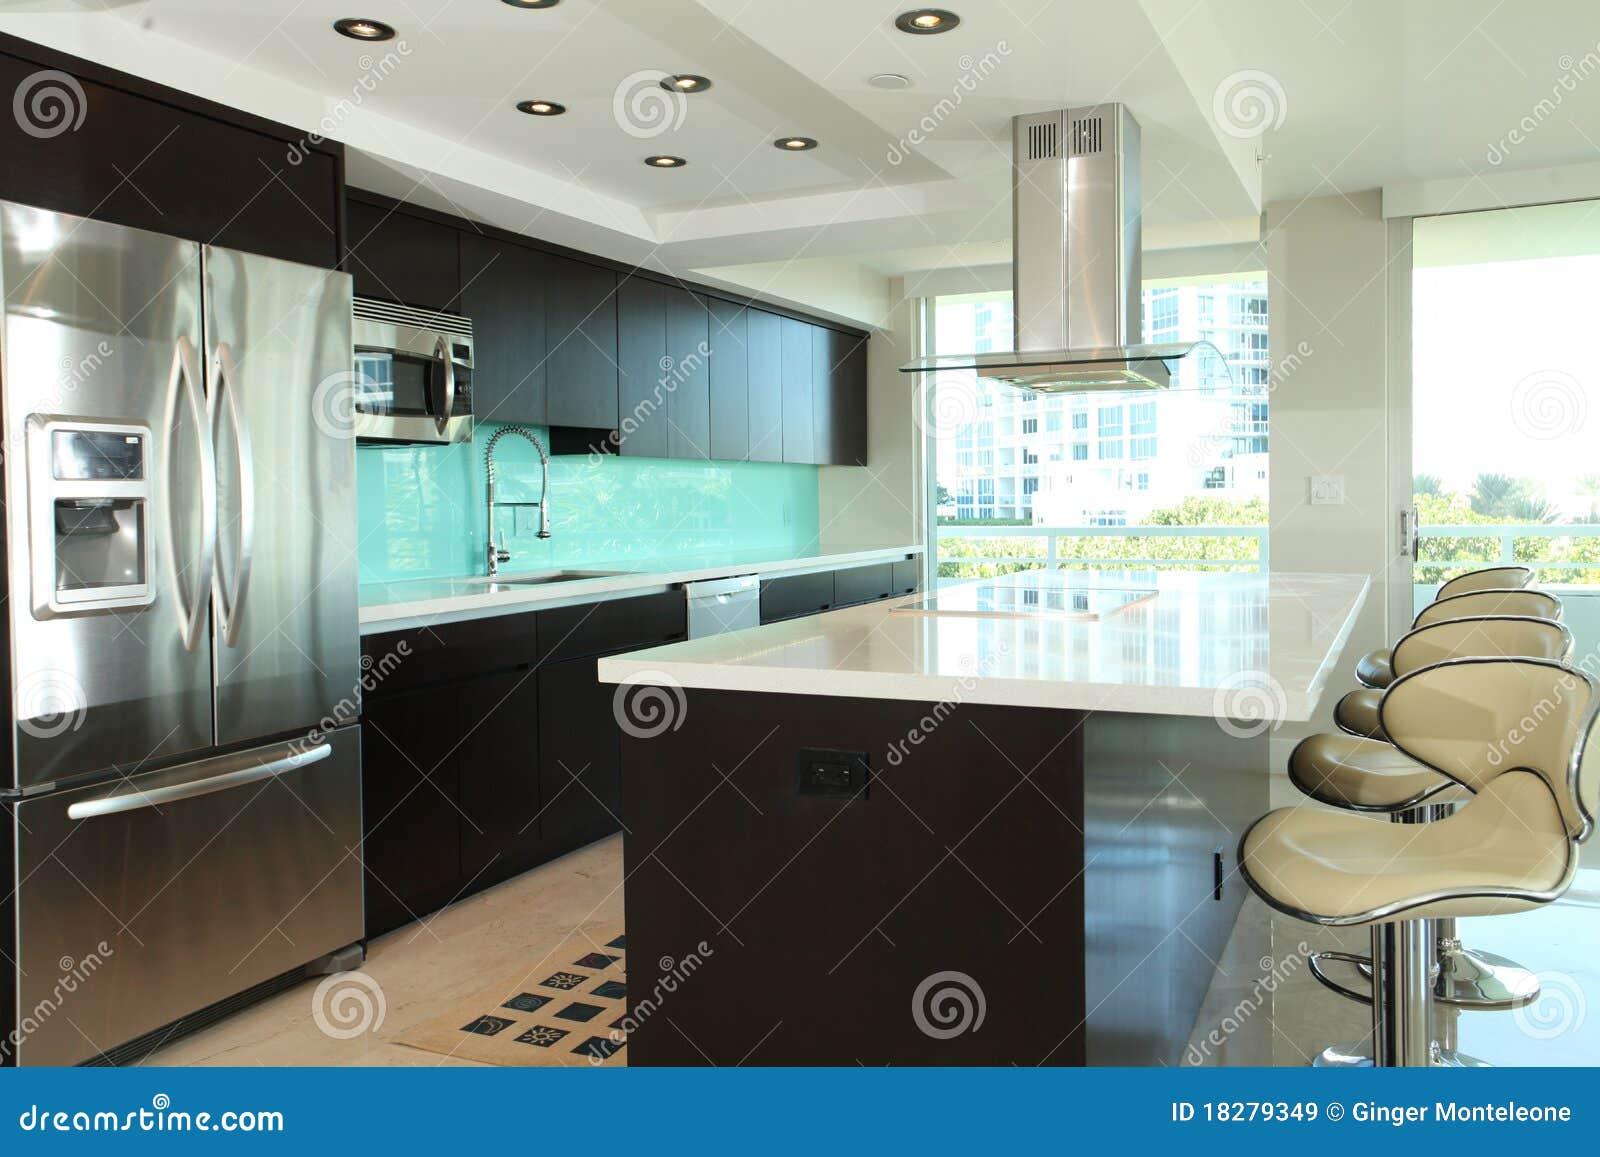 Moderne keuken royalty vrije stock afbeeldingen afbeelding 18279349 - Afbeelding moderne keuken ...